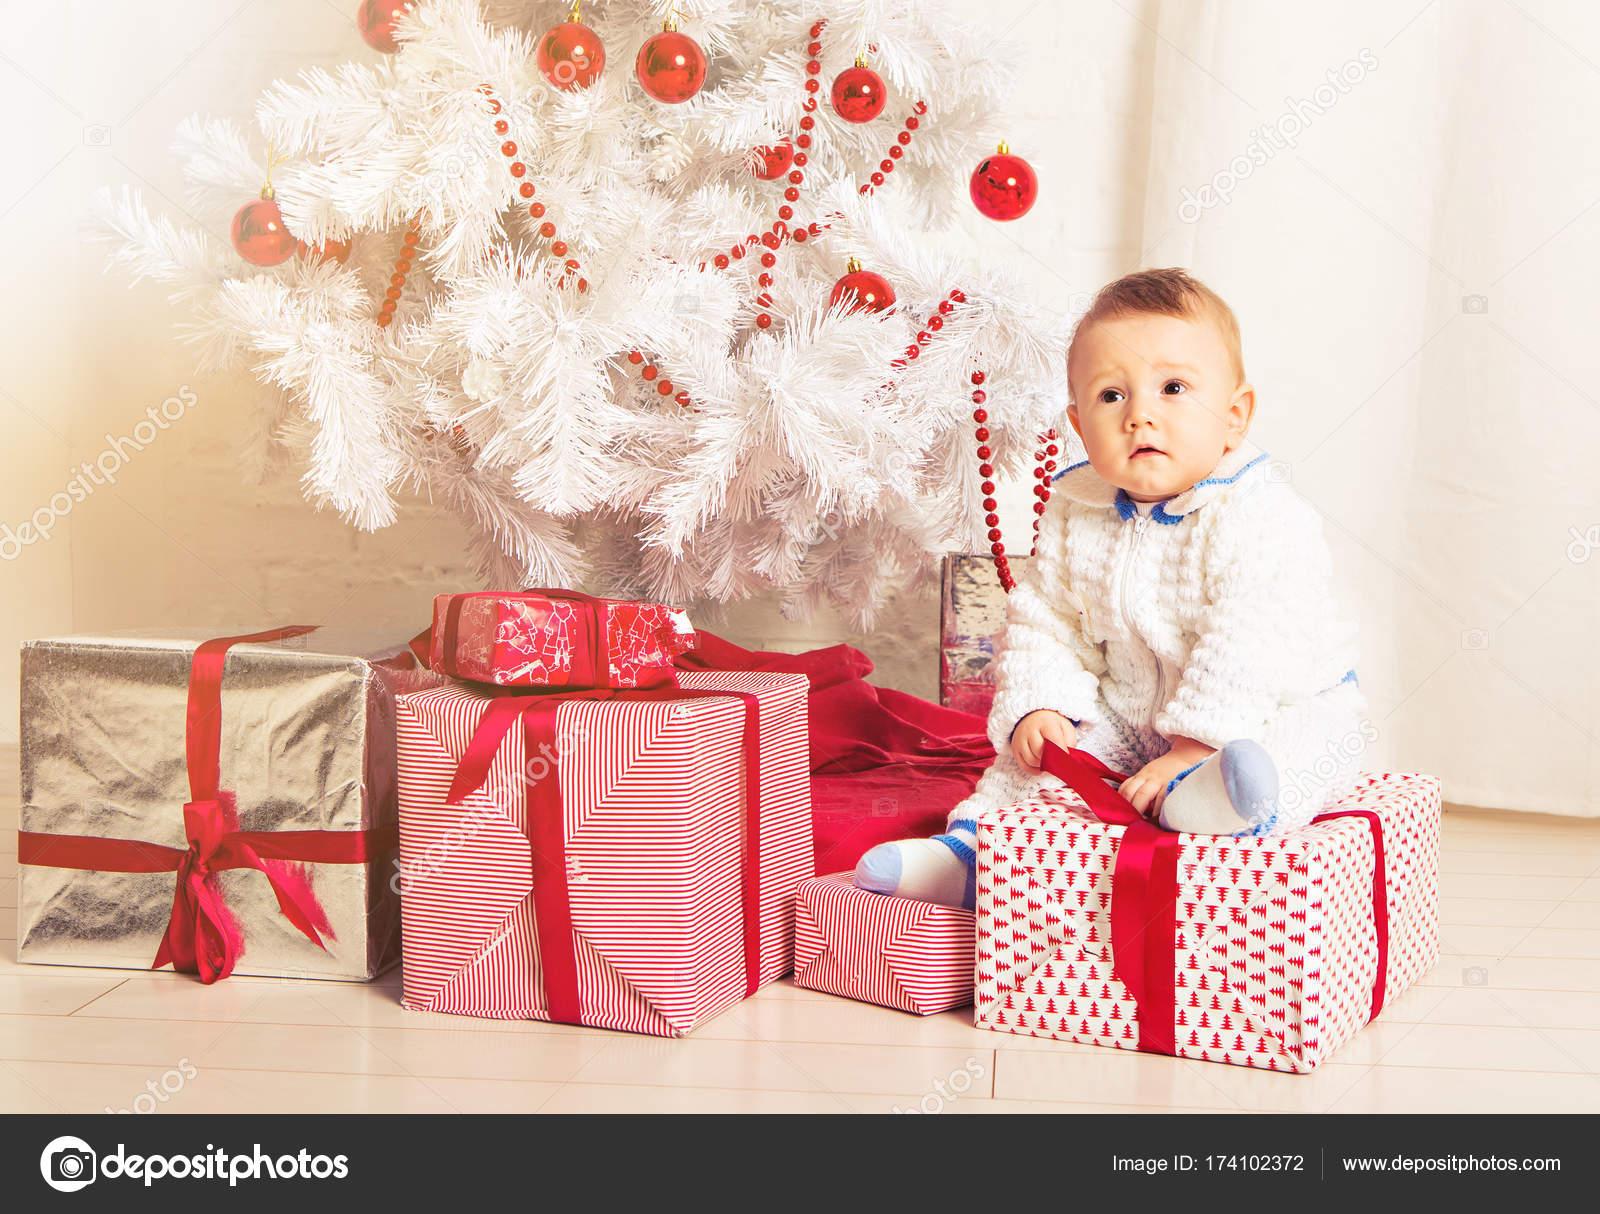 fd096057a62 Μωρό 1 έτους κάθεται σε συσκευασία δώρου με Χριστουγεννιάτικο δέντρο. Καλά  Χριστούγεννα. Περίοδος διακοπών